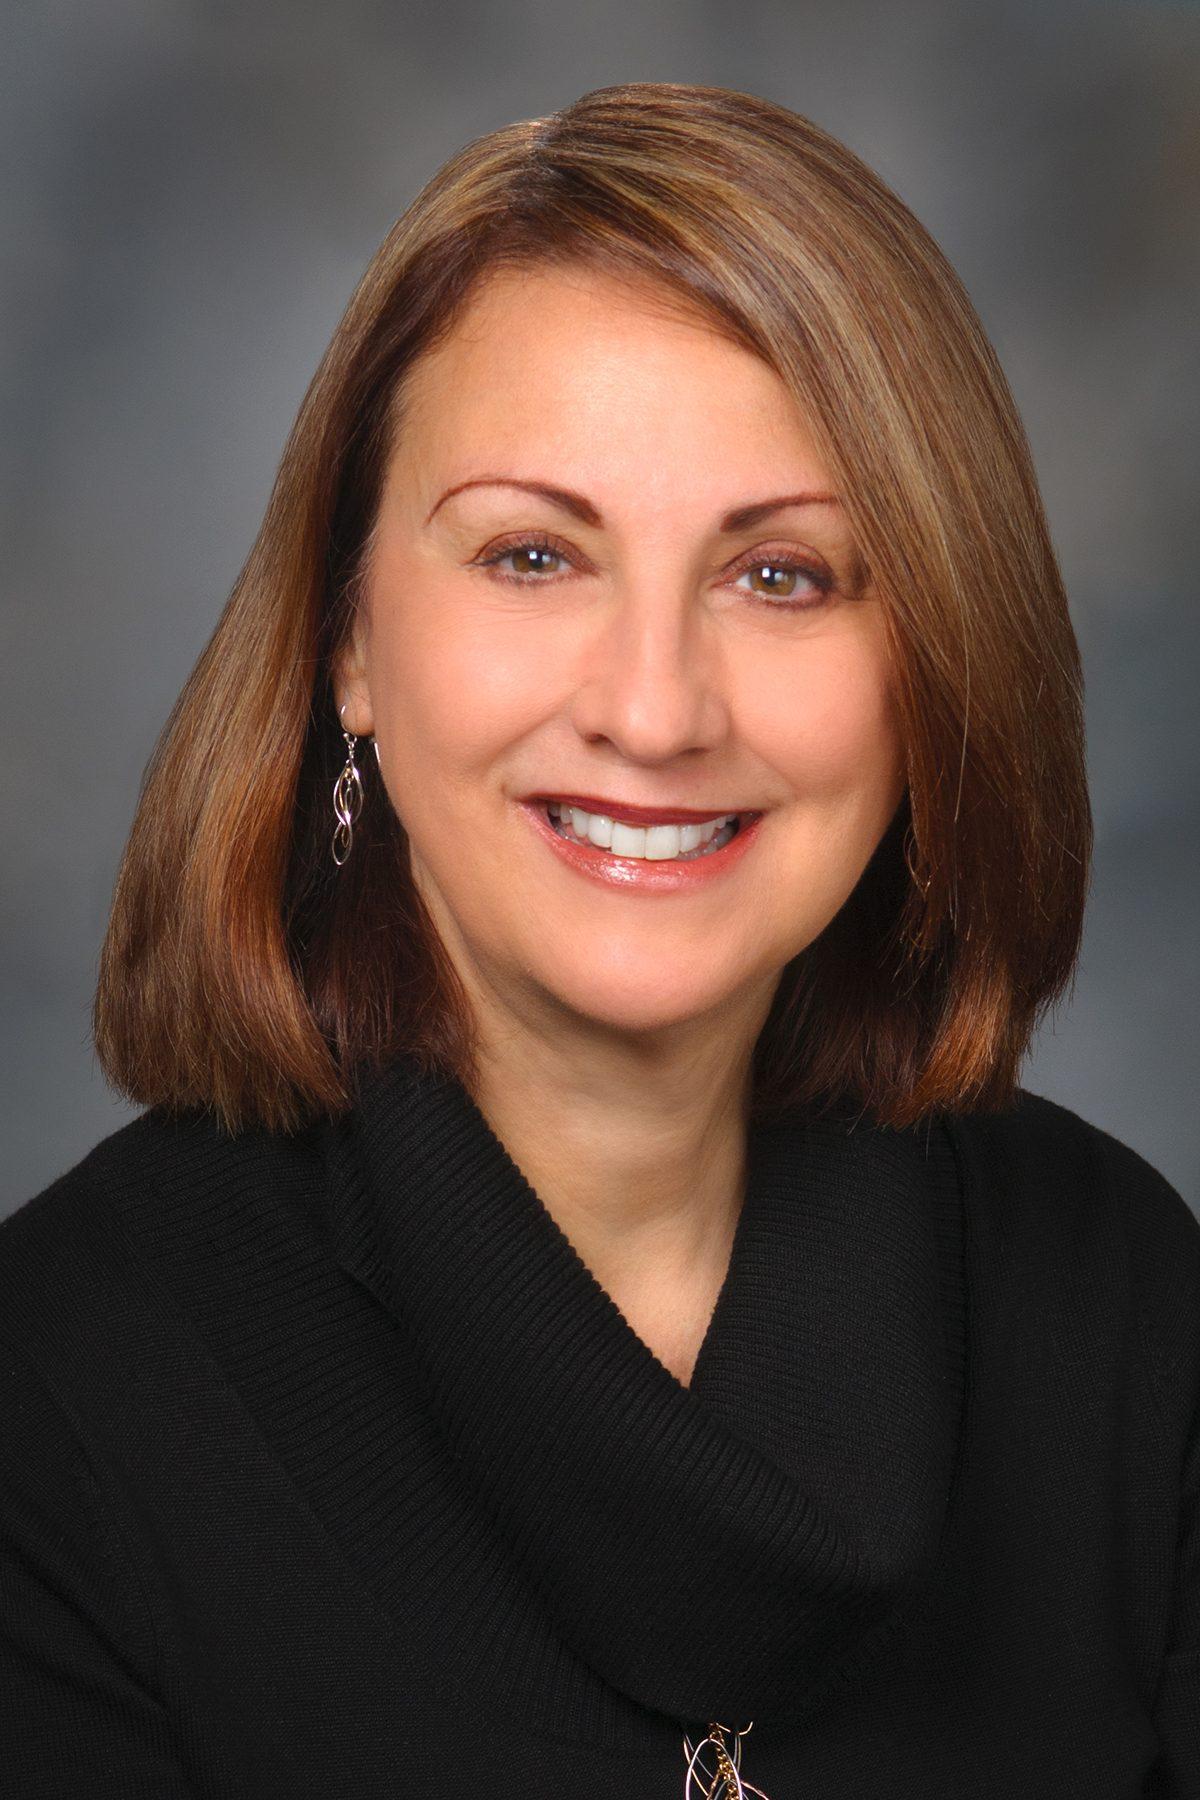 Pamela J Schlembach Md Anderson Cancer Center-9467